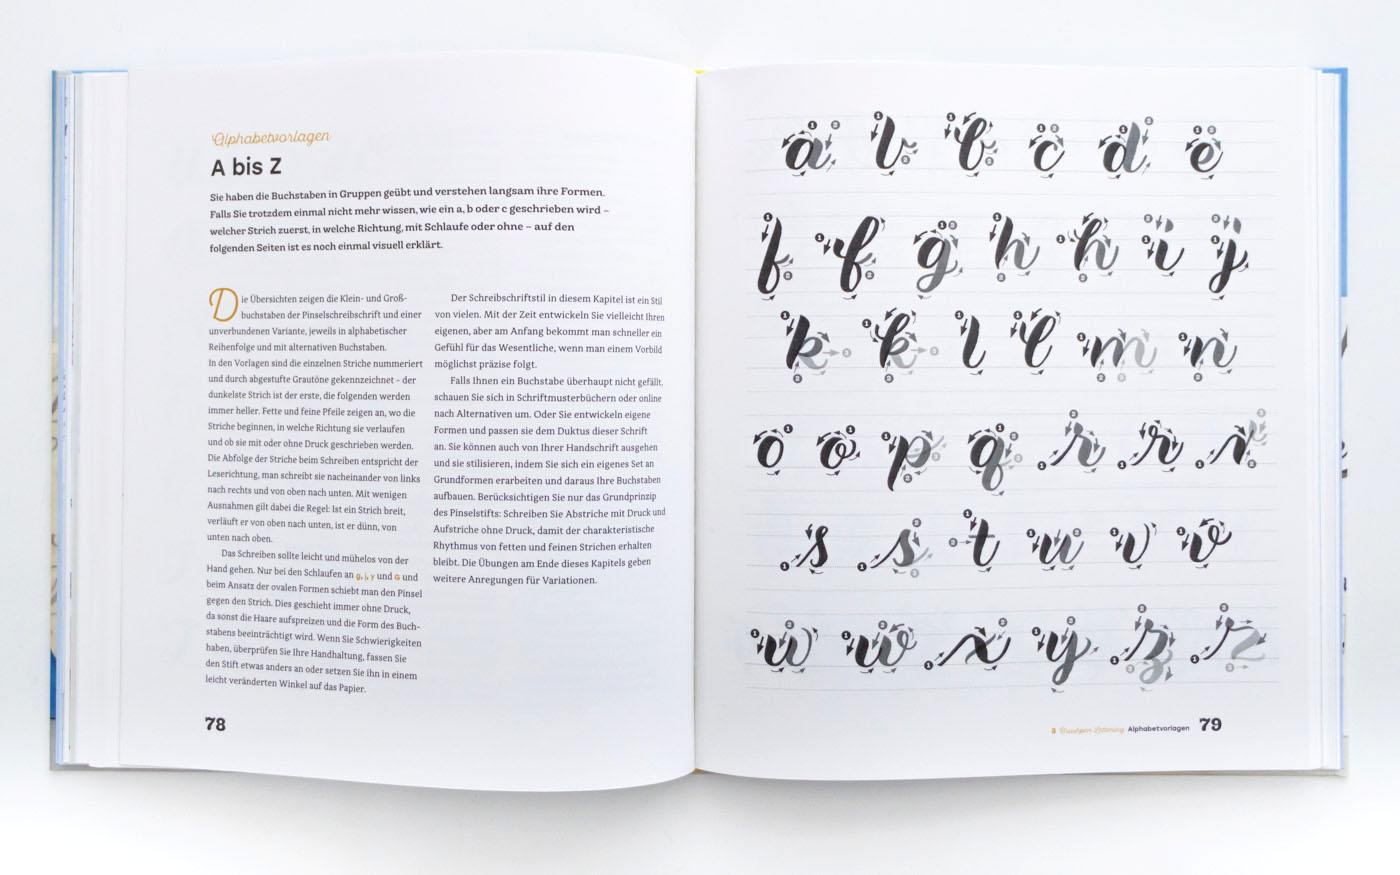 Campe_Handbuch-Handlettering_978-3-258-60165-6_-13.jpg